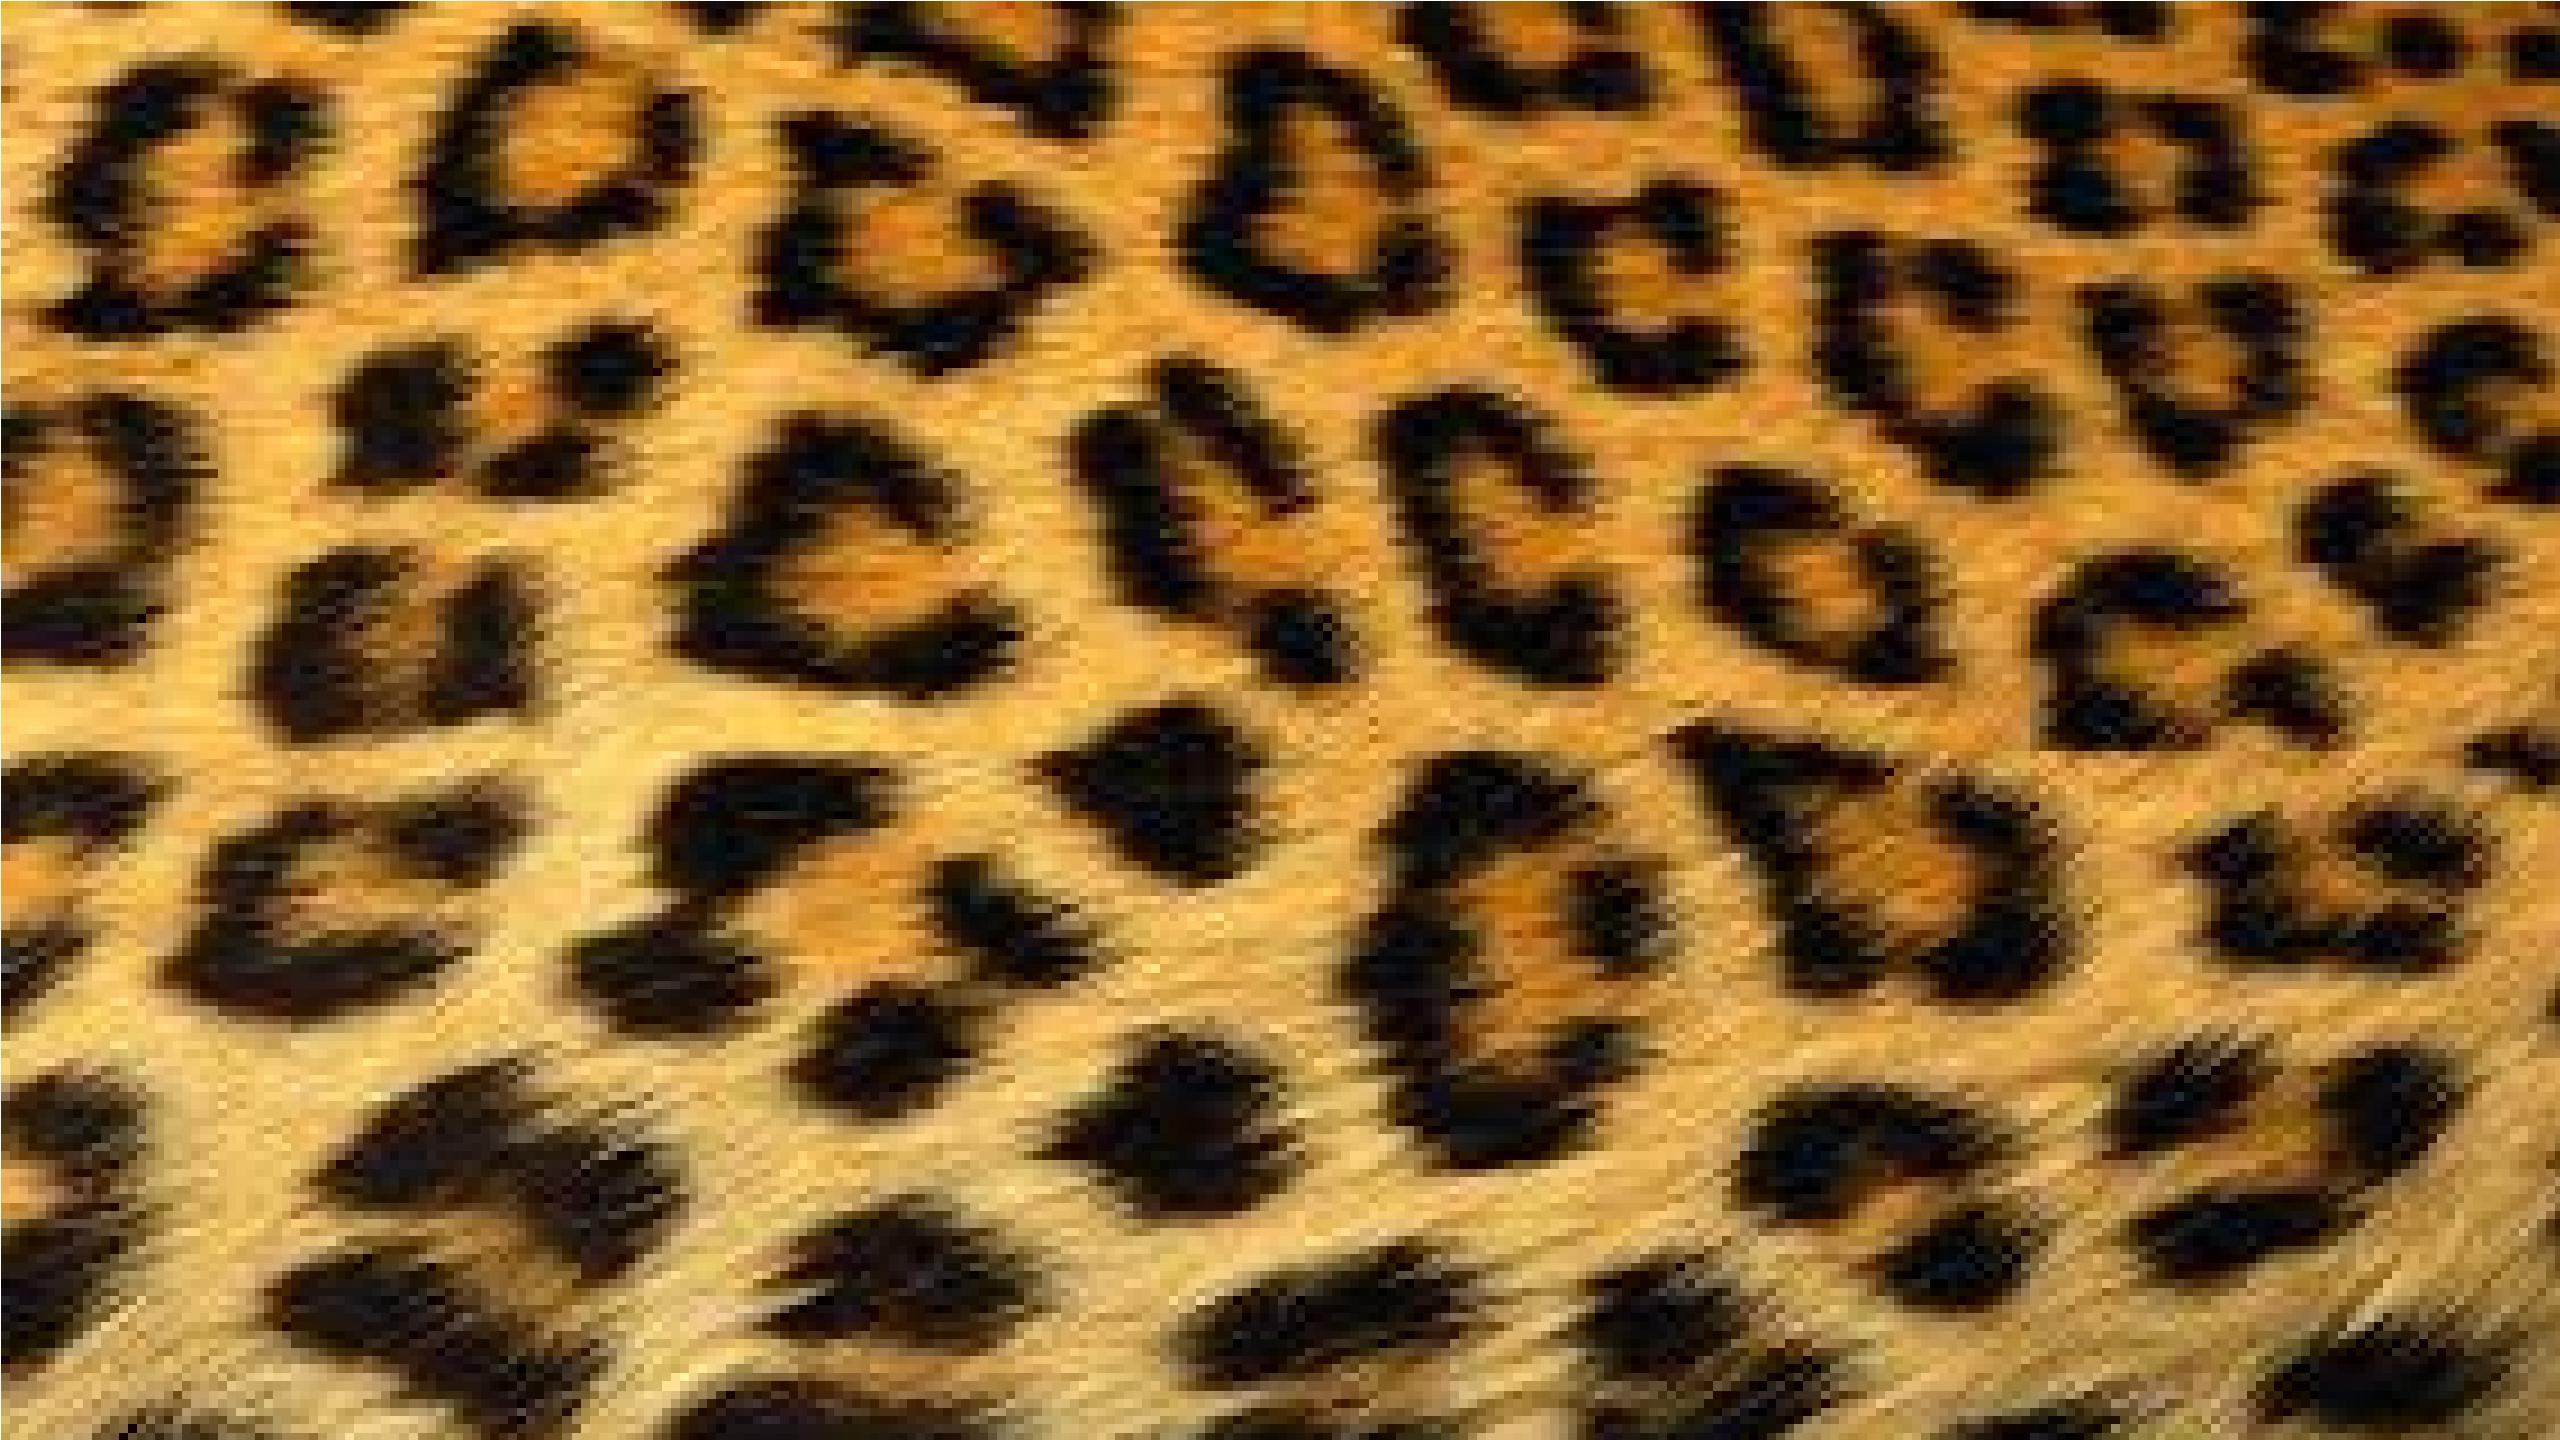 Large Cheetah فر, سمور پیپر وال